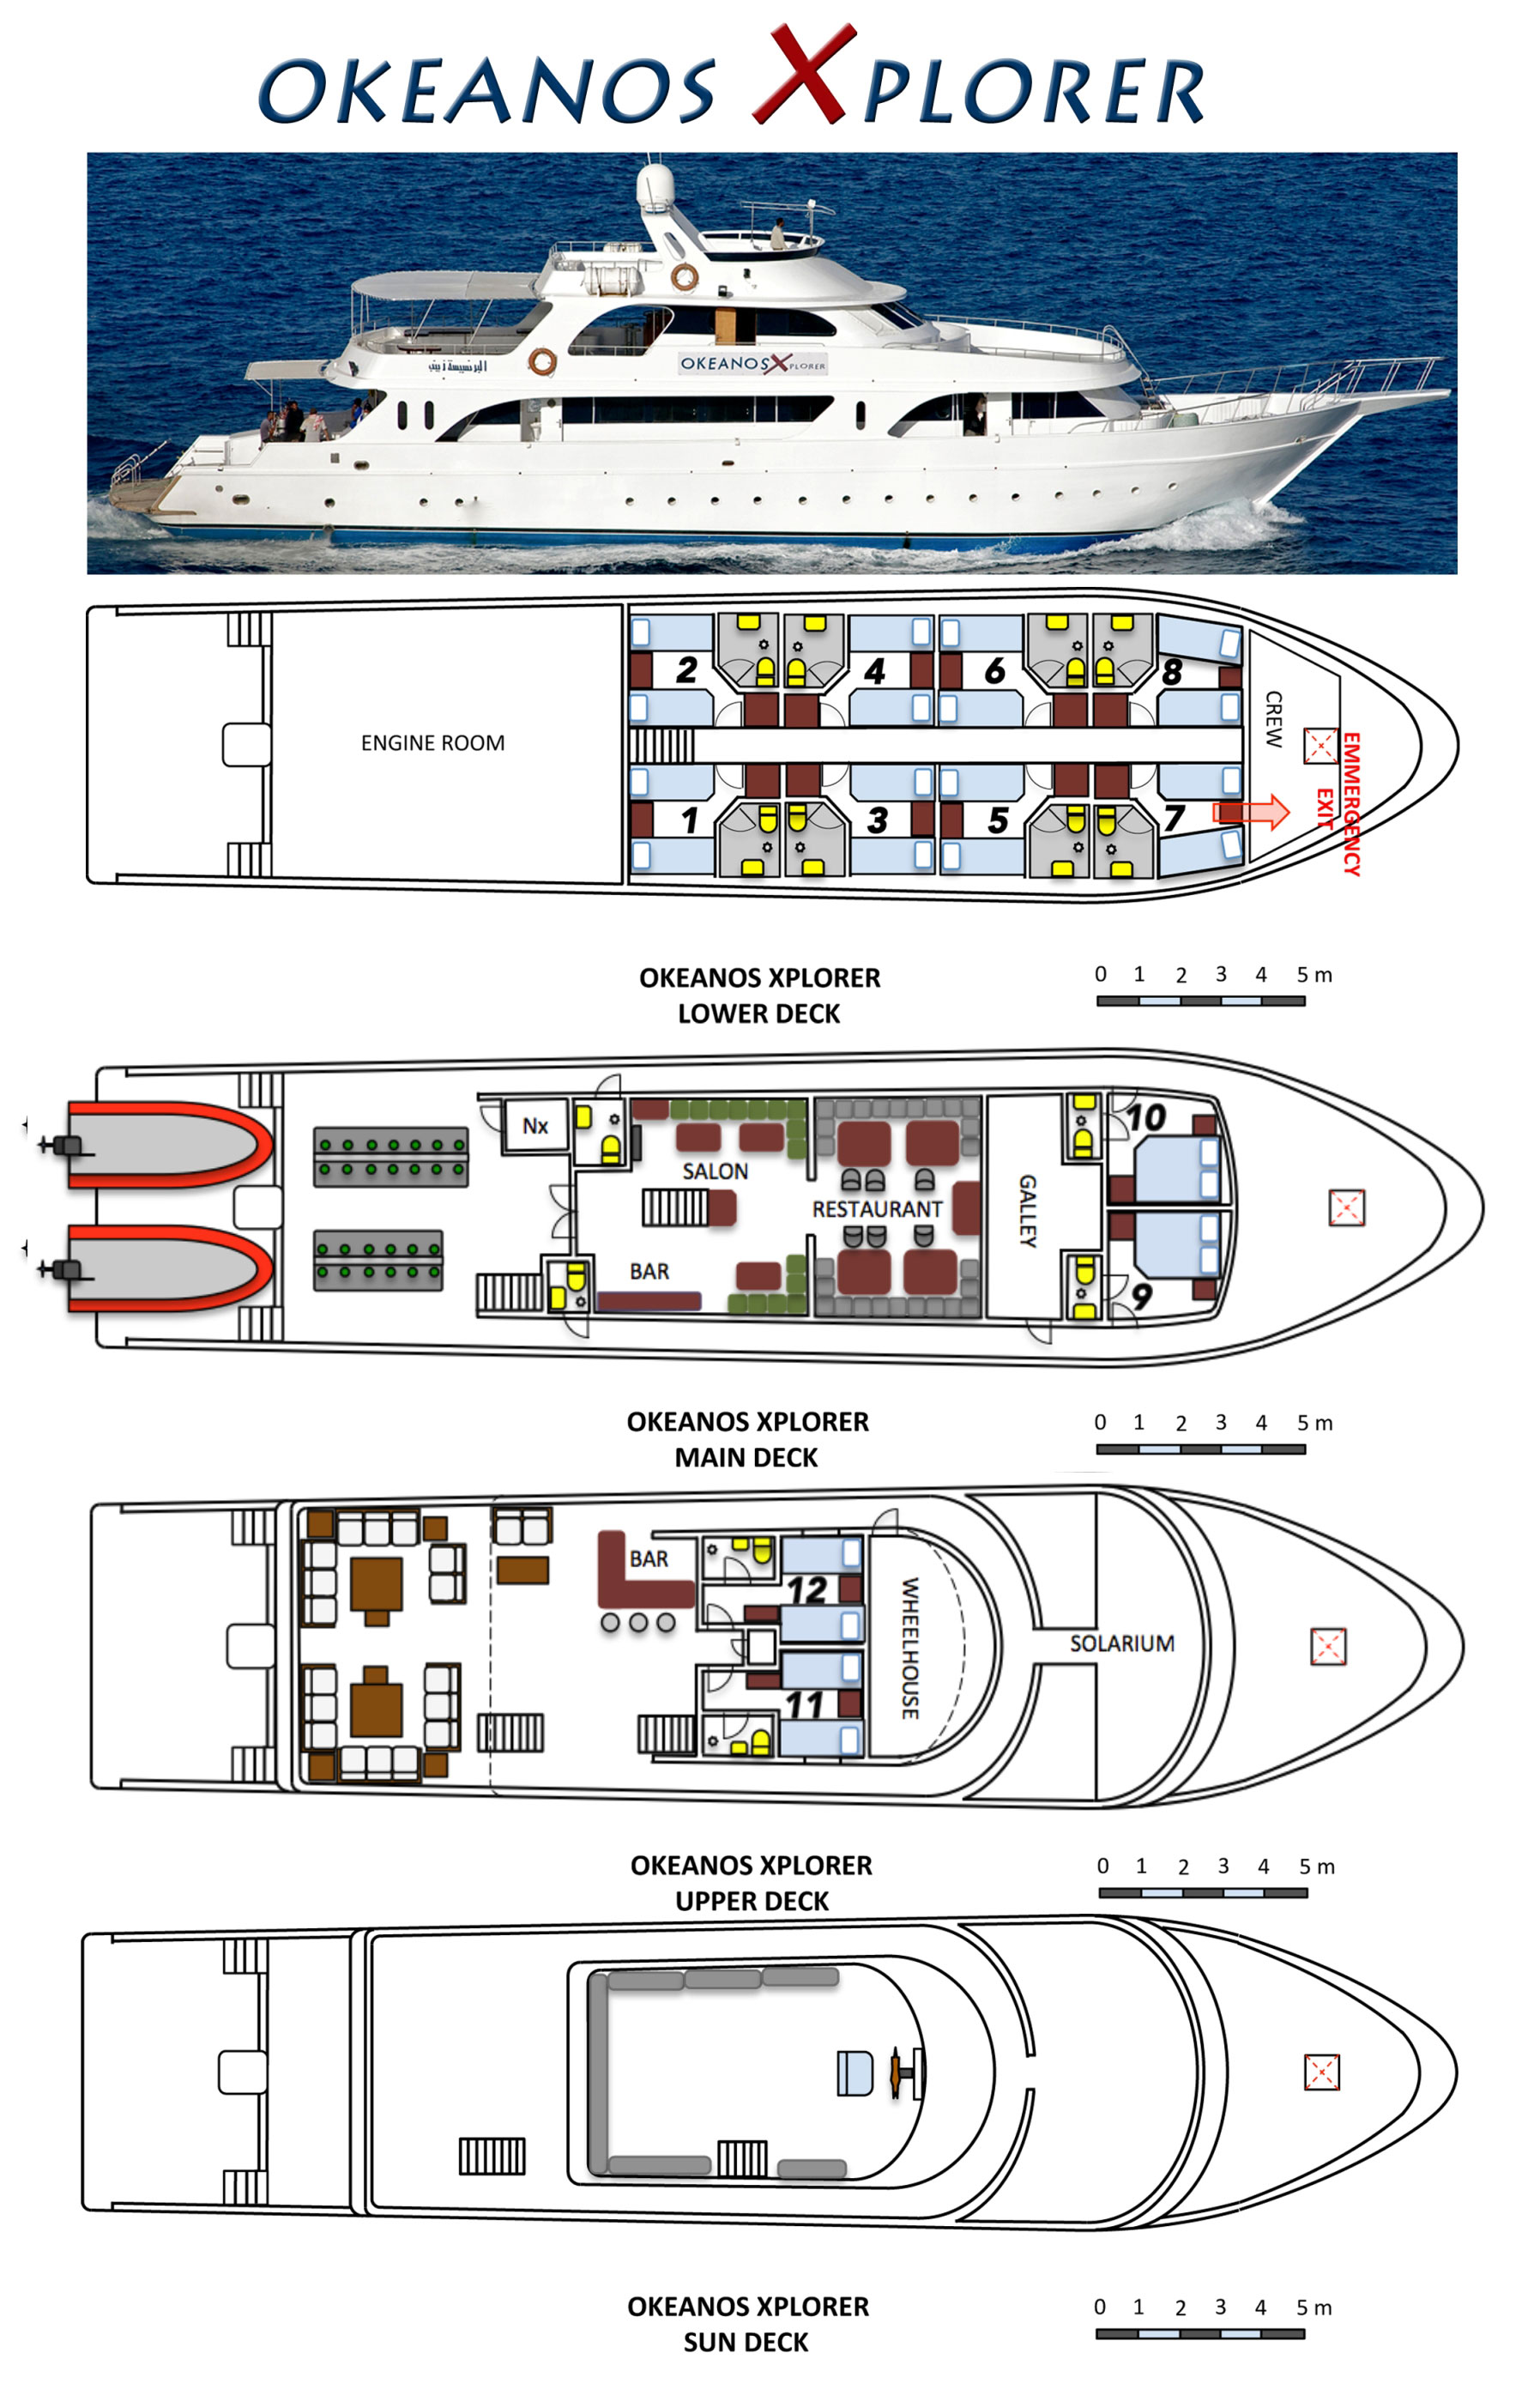 Okeanos Xplorer Boat